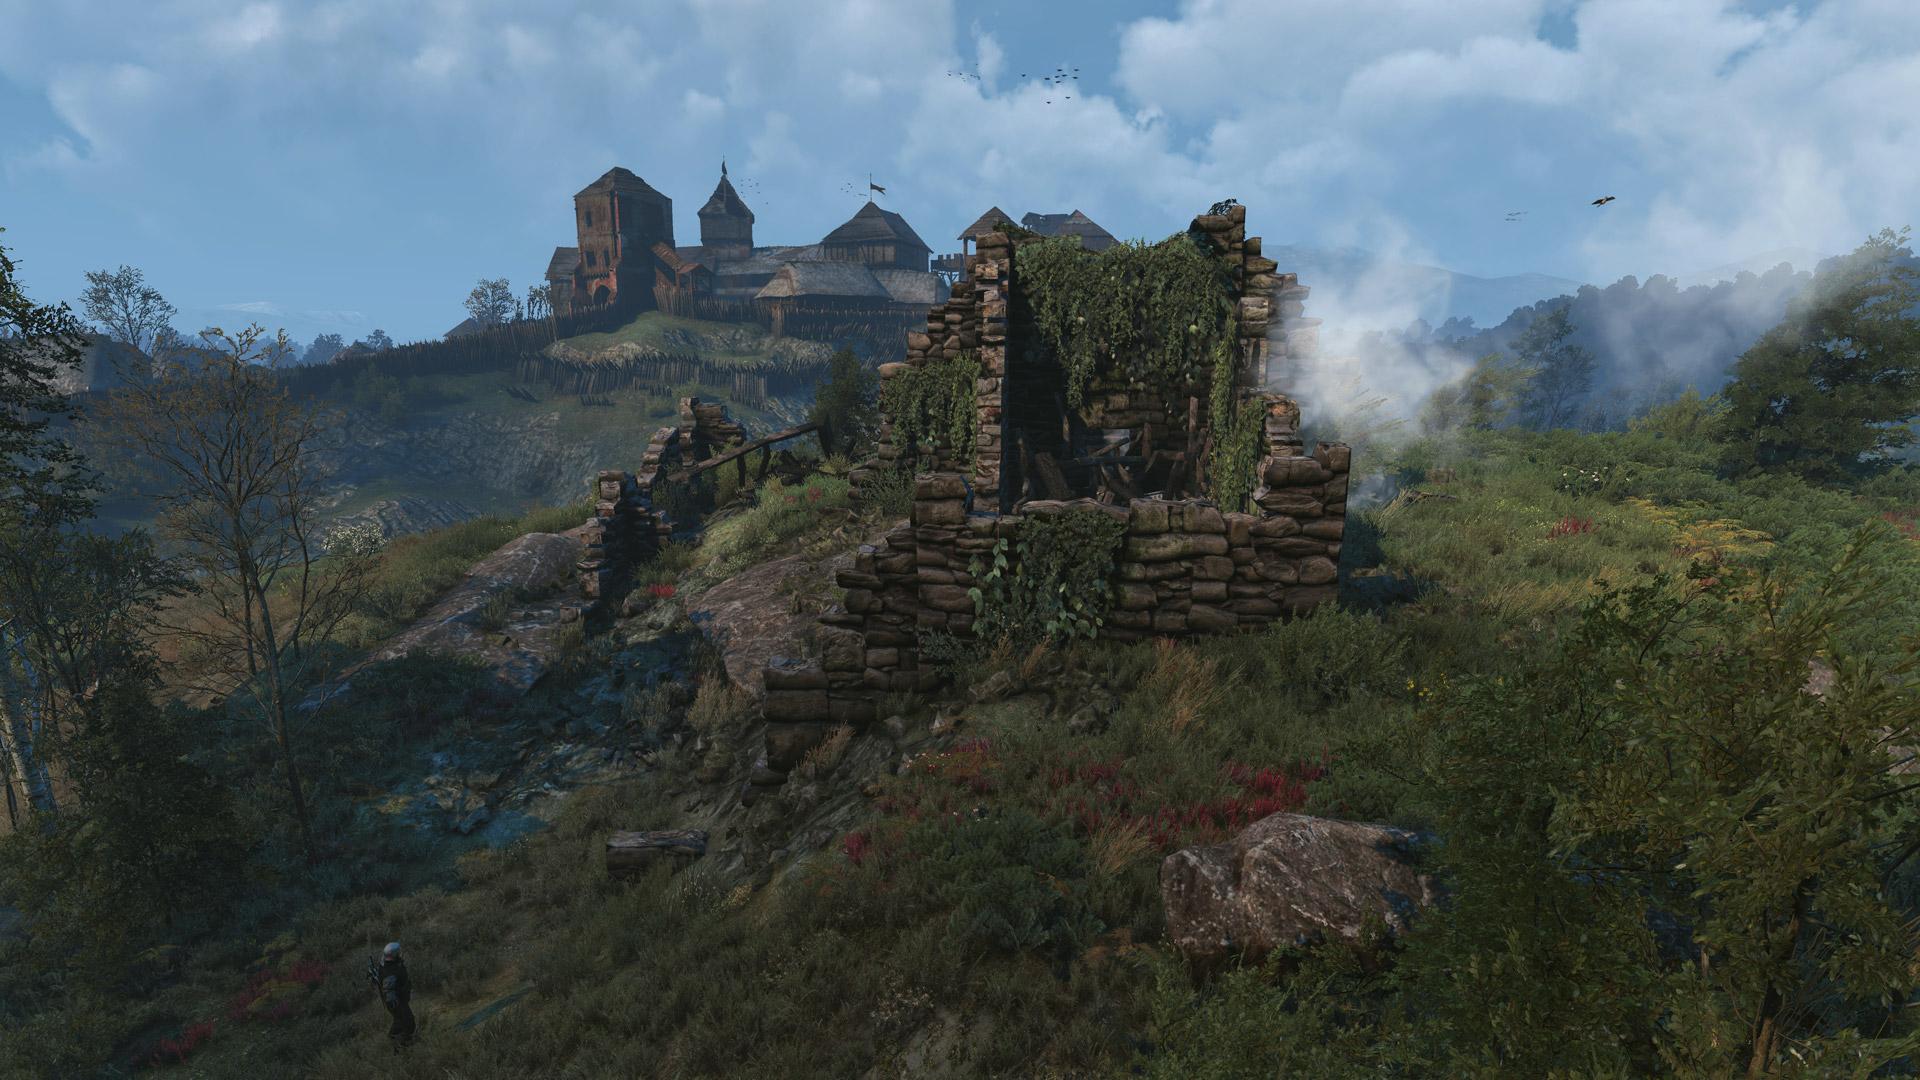 Burned Ruins